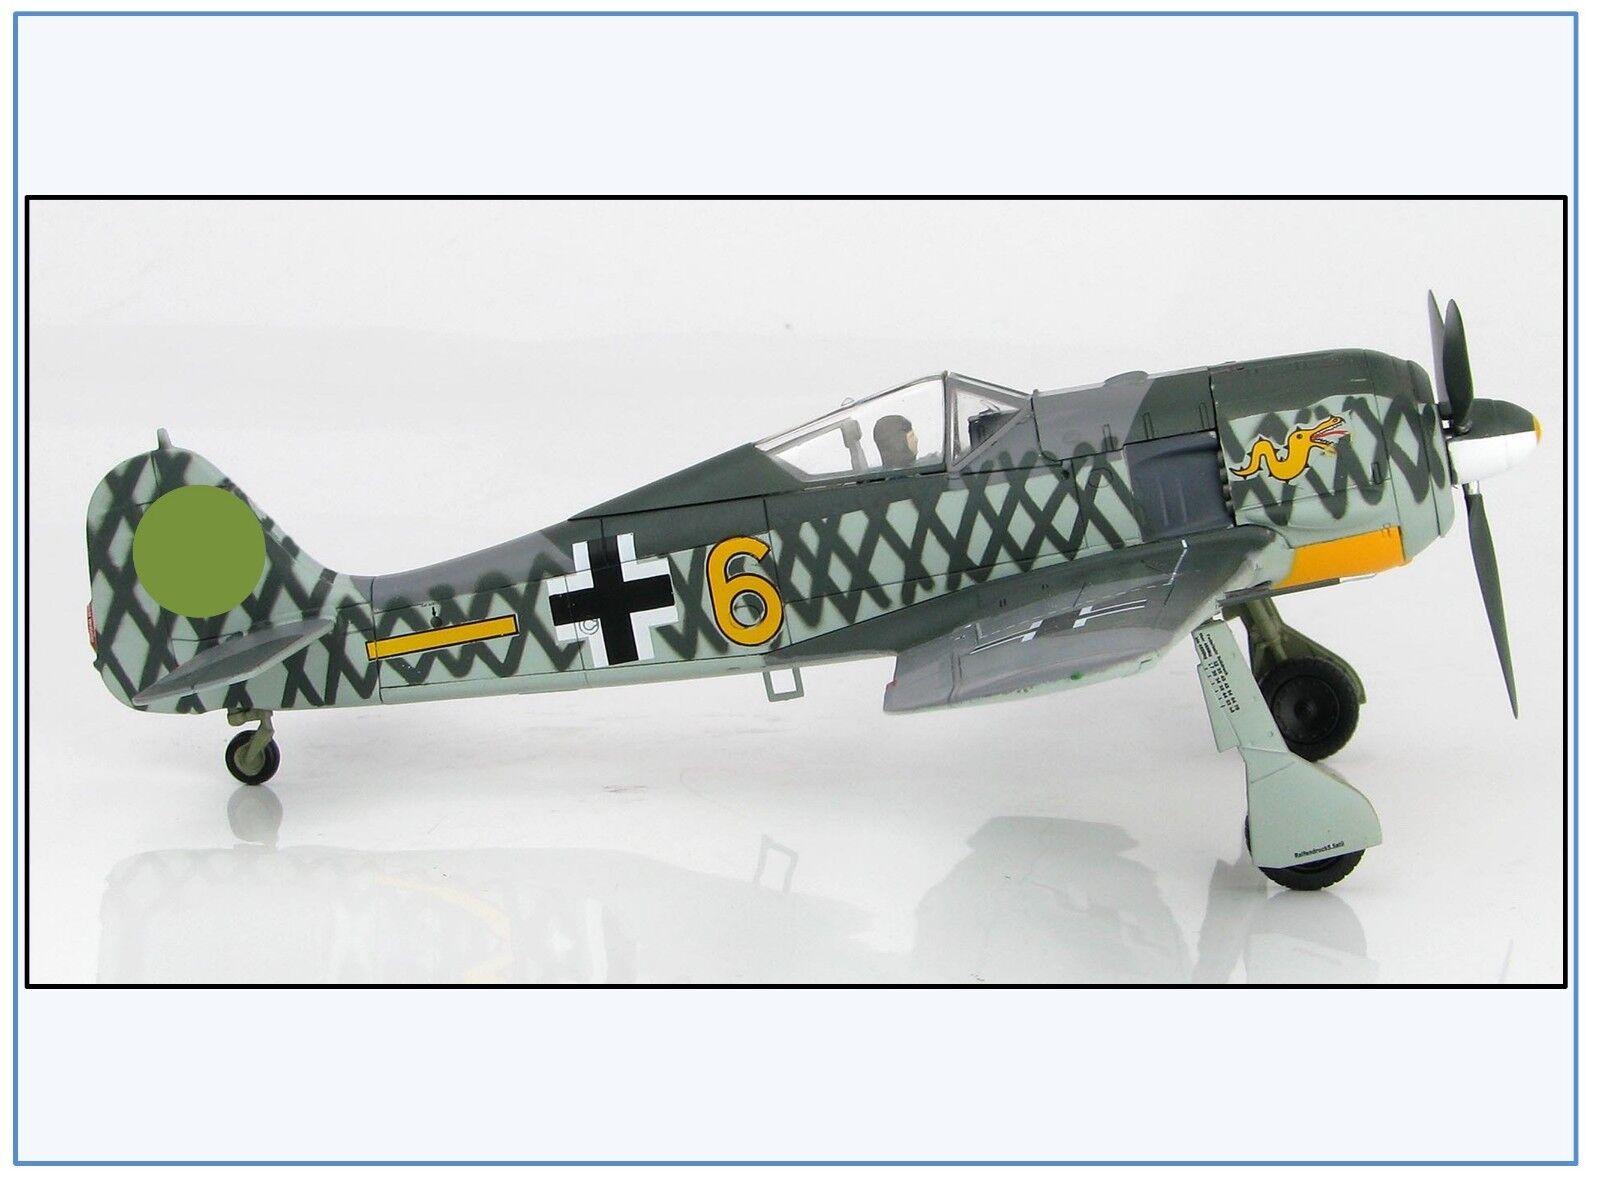 Ha7423 fw-190a-4 6. JG 1, 6 gialle, Holland, OTT 1942, HOBBYMASTER 1 48,neu 10 18 &